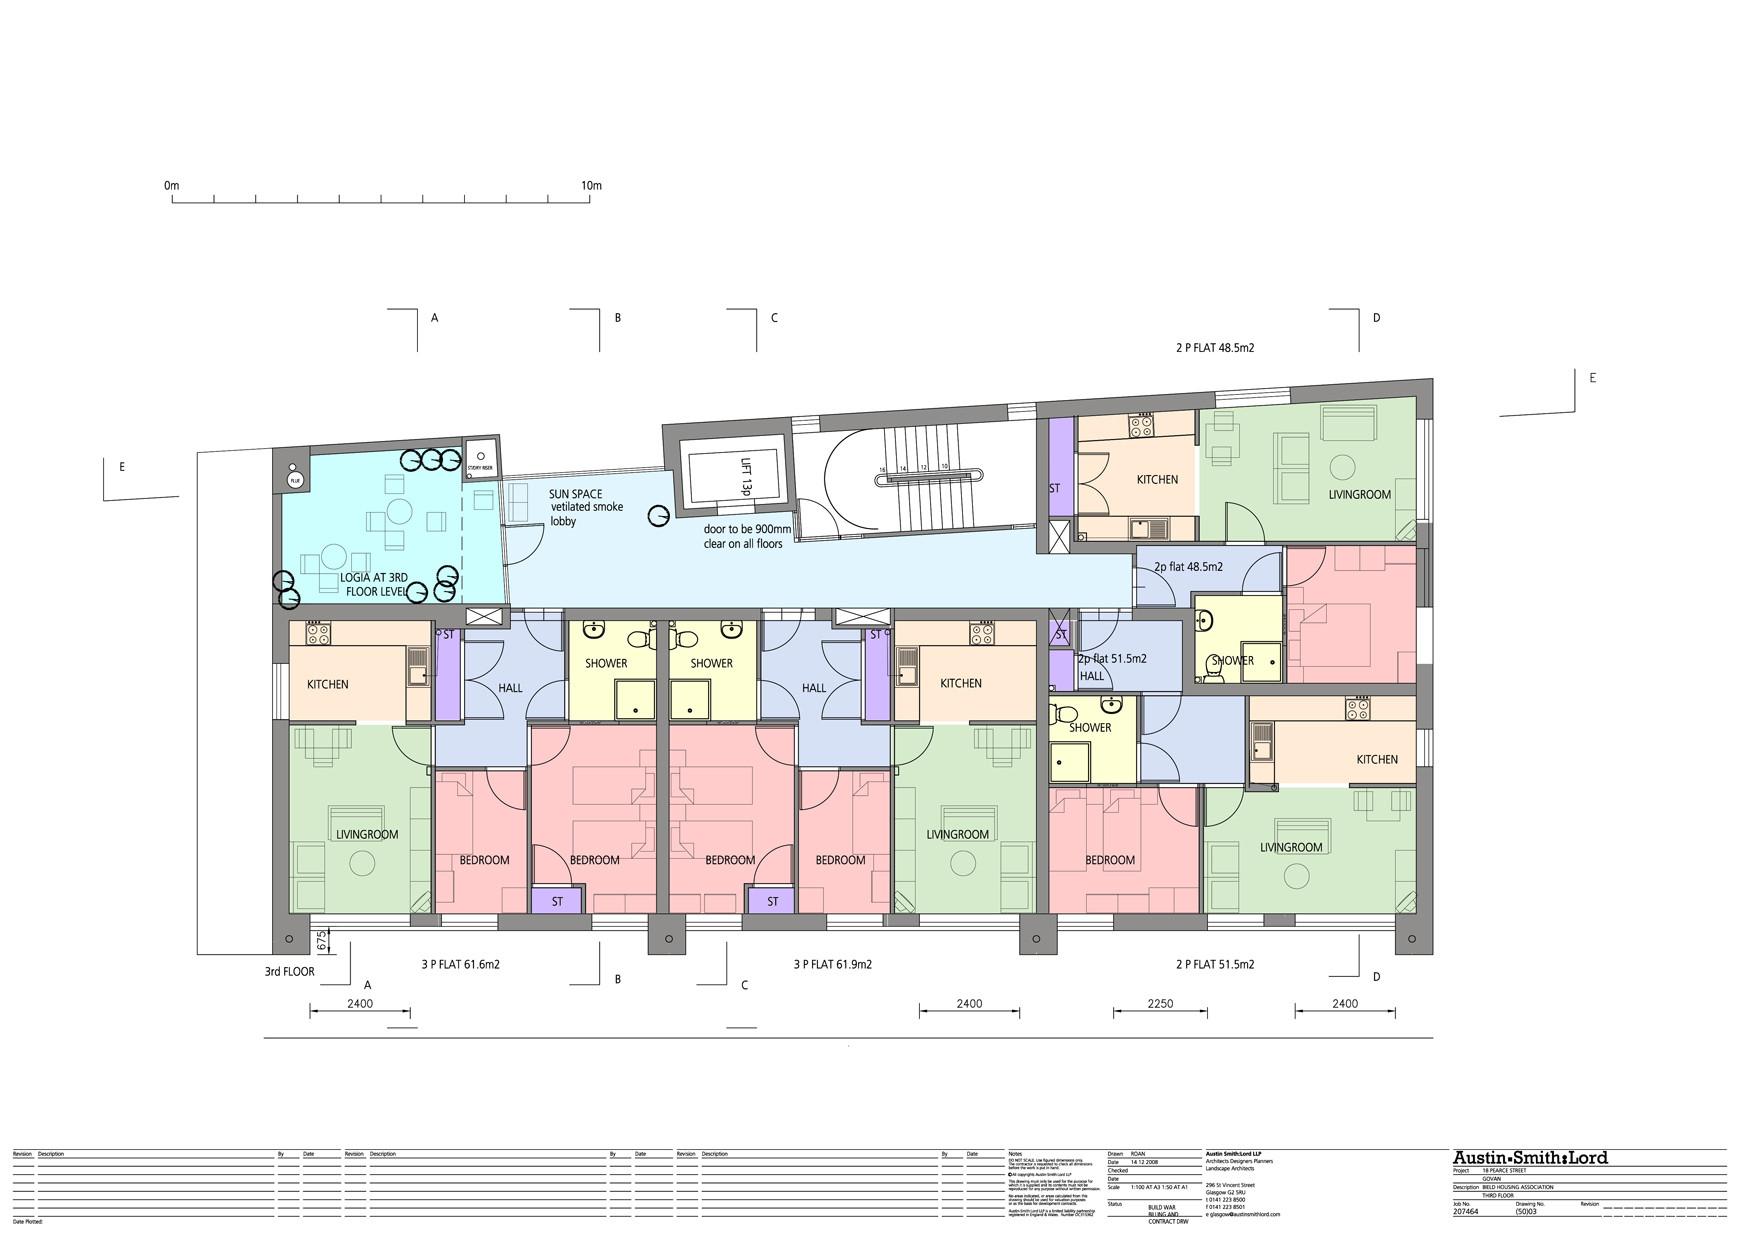 Gallery of pearce street govan austin smith lord 7 for Floor plans brown university